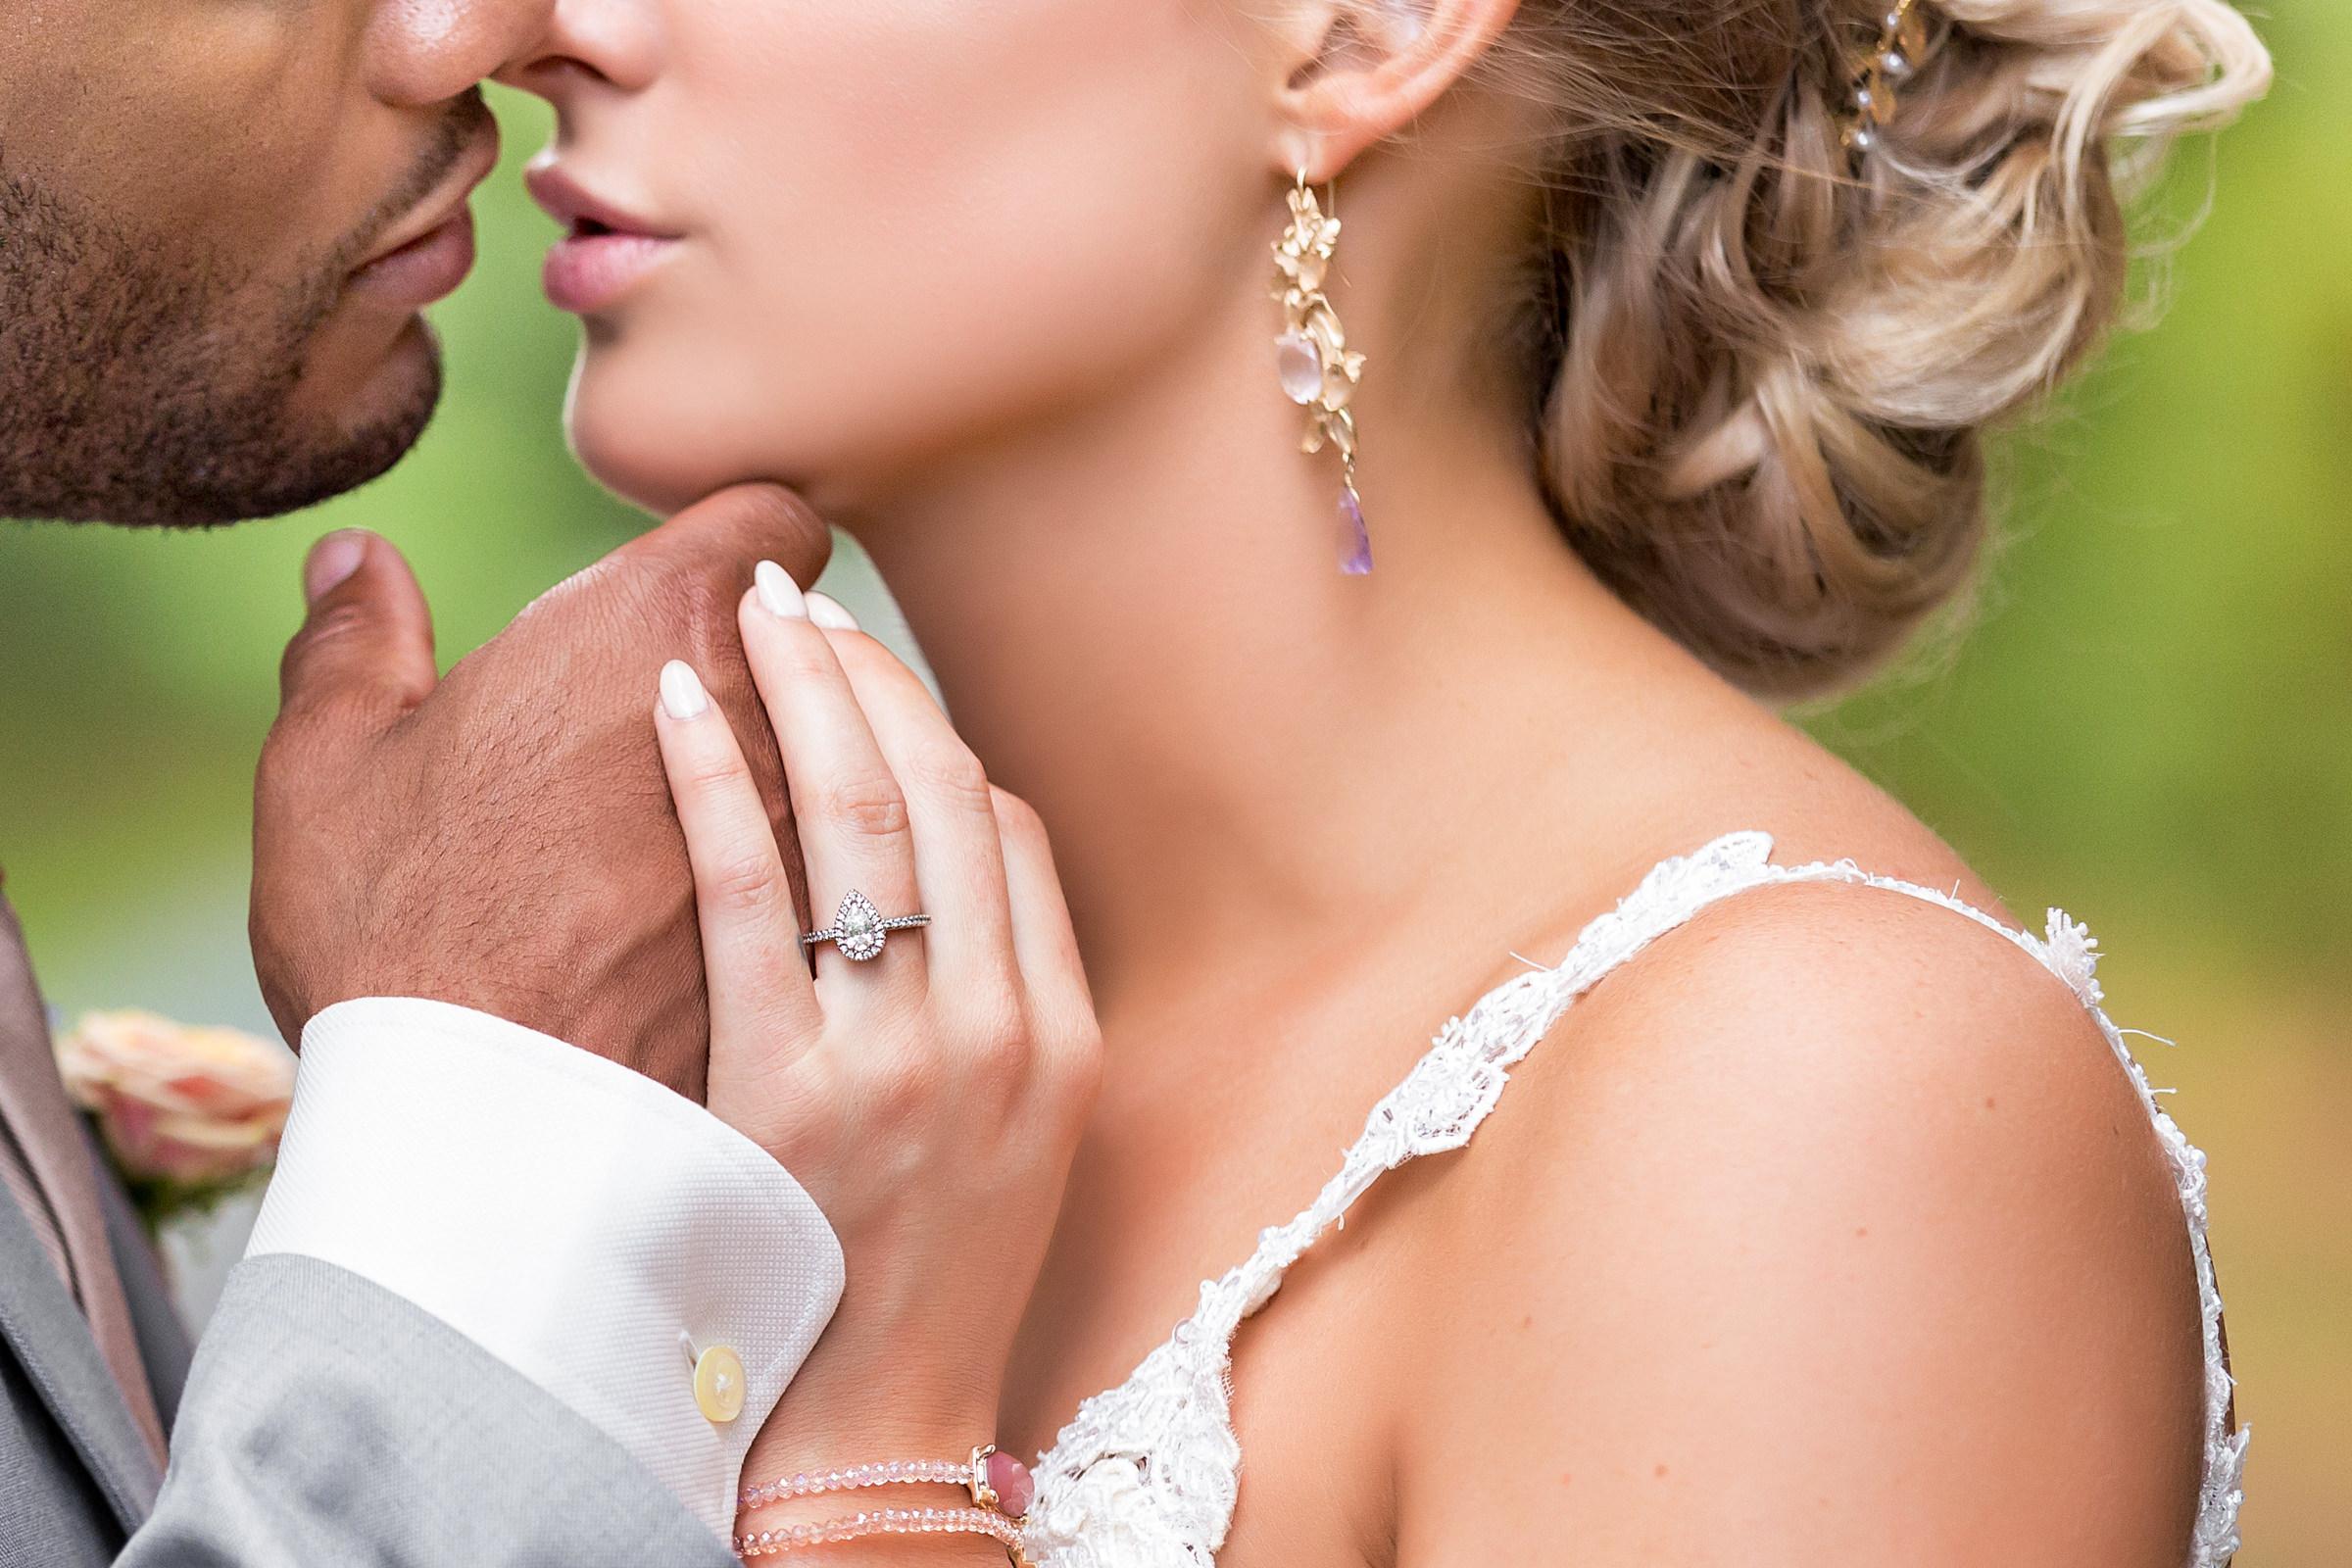 detail-of-couple-kiss-procopio-photography